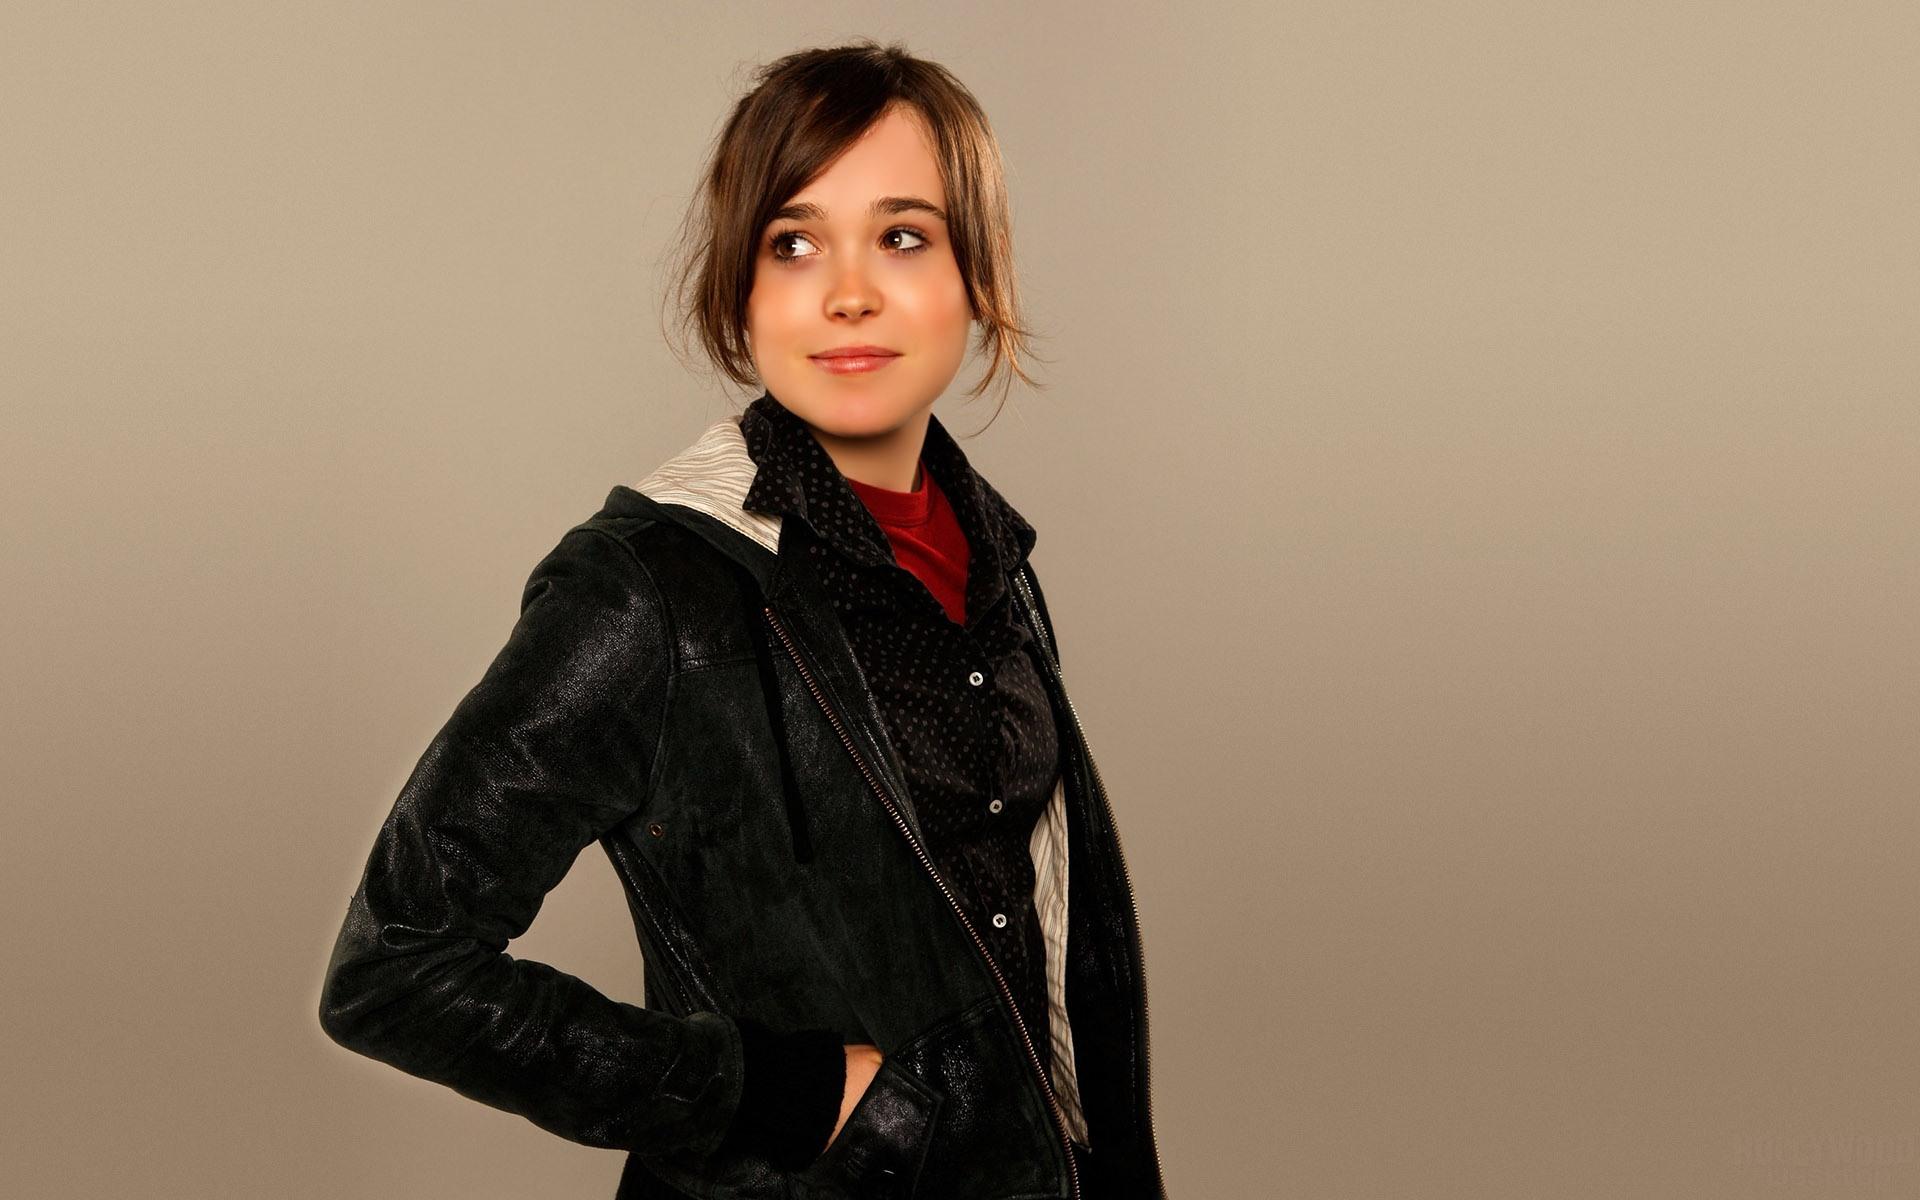 Ellen Page Wallpaper-7